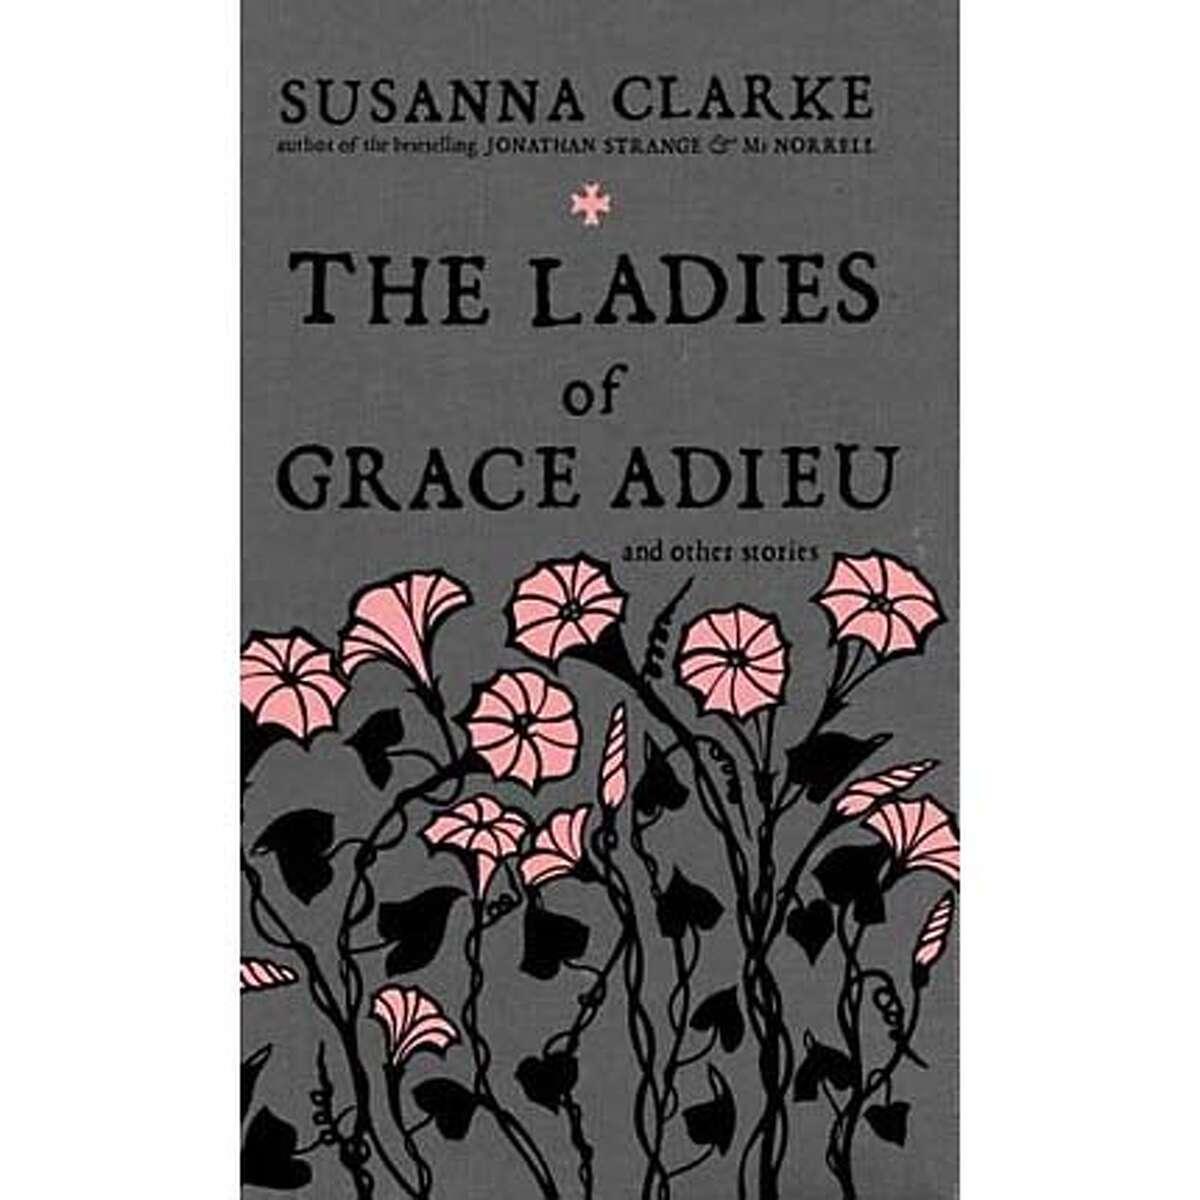 """The Ladies of Grace Adieu"" by Susanna Clarke"